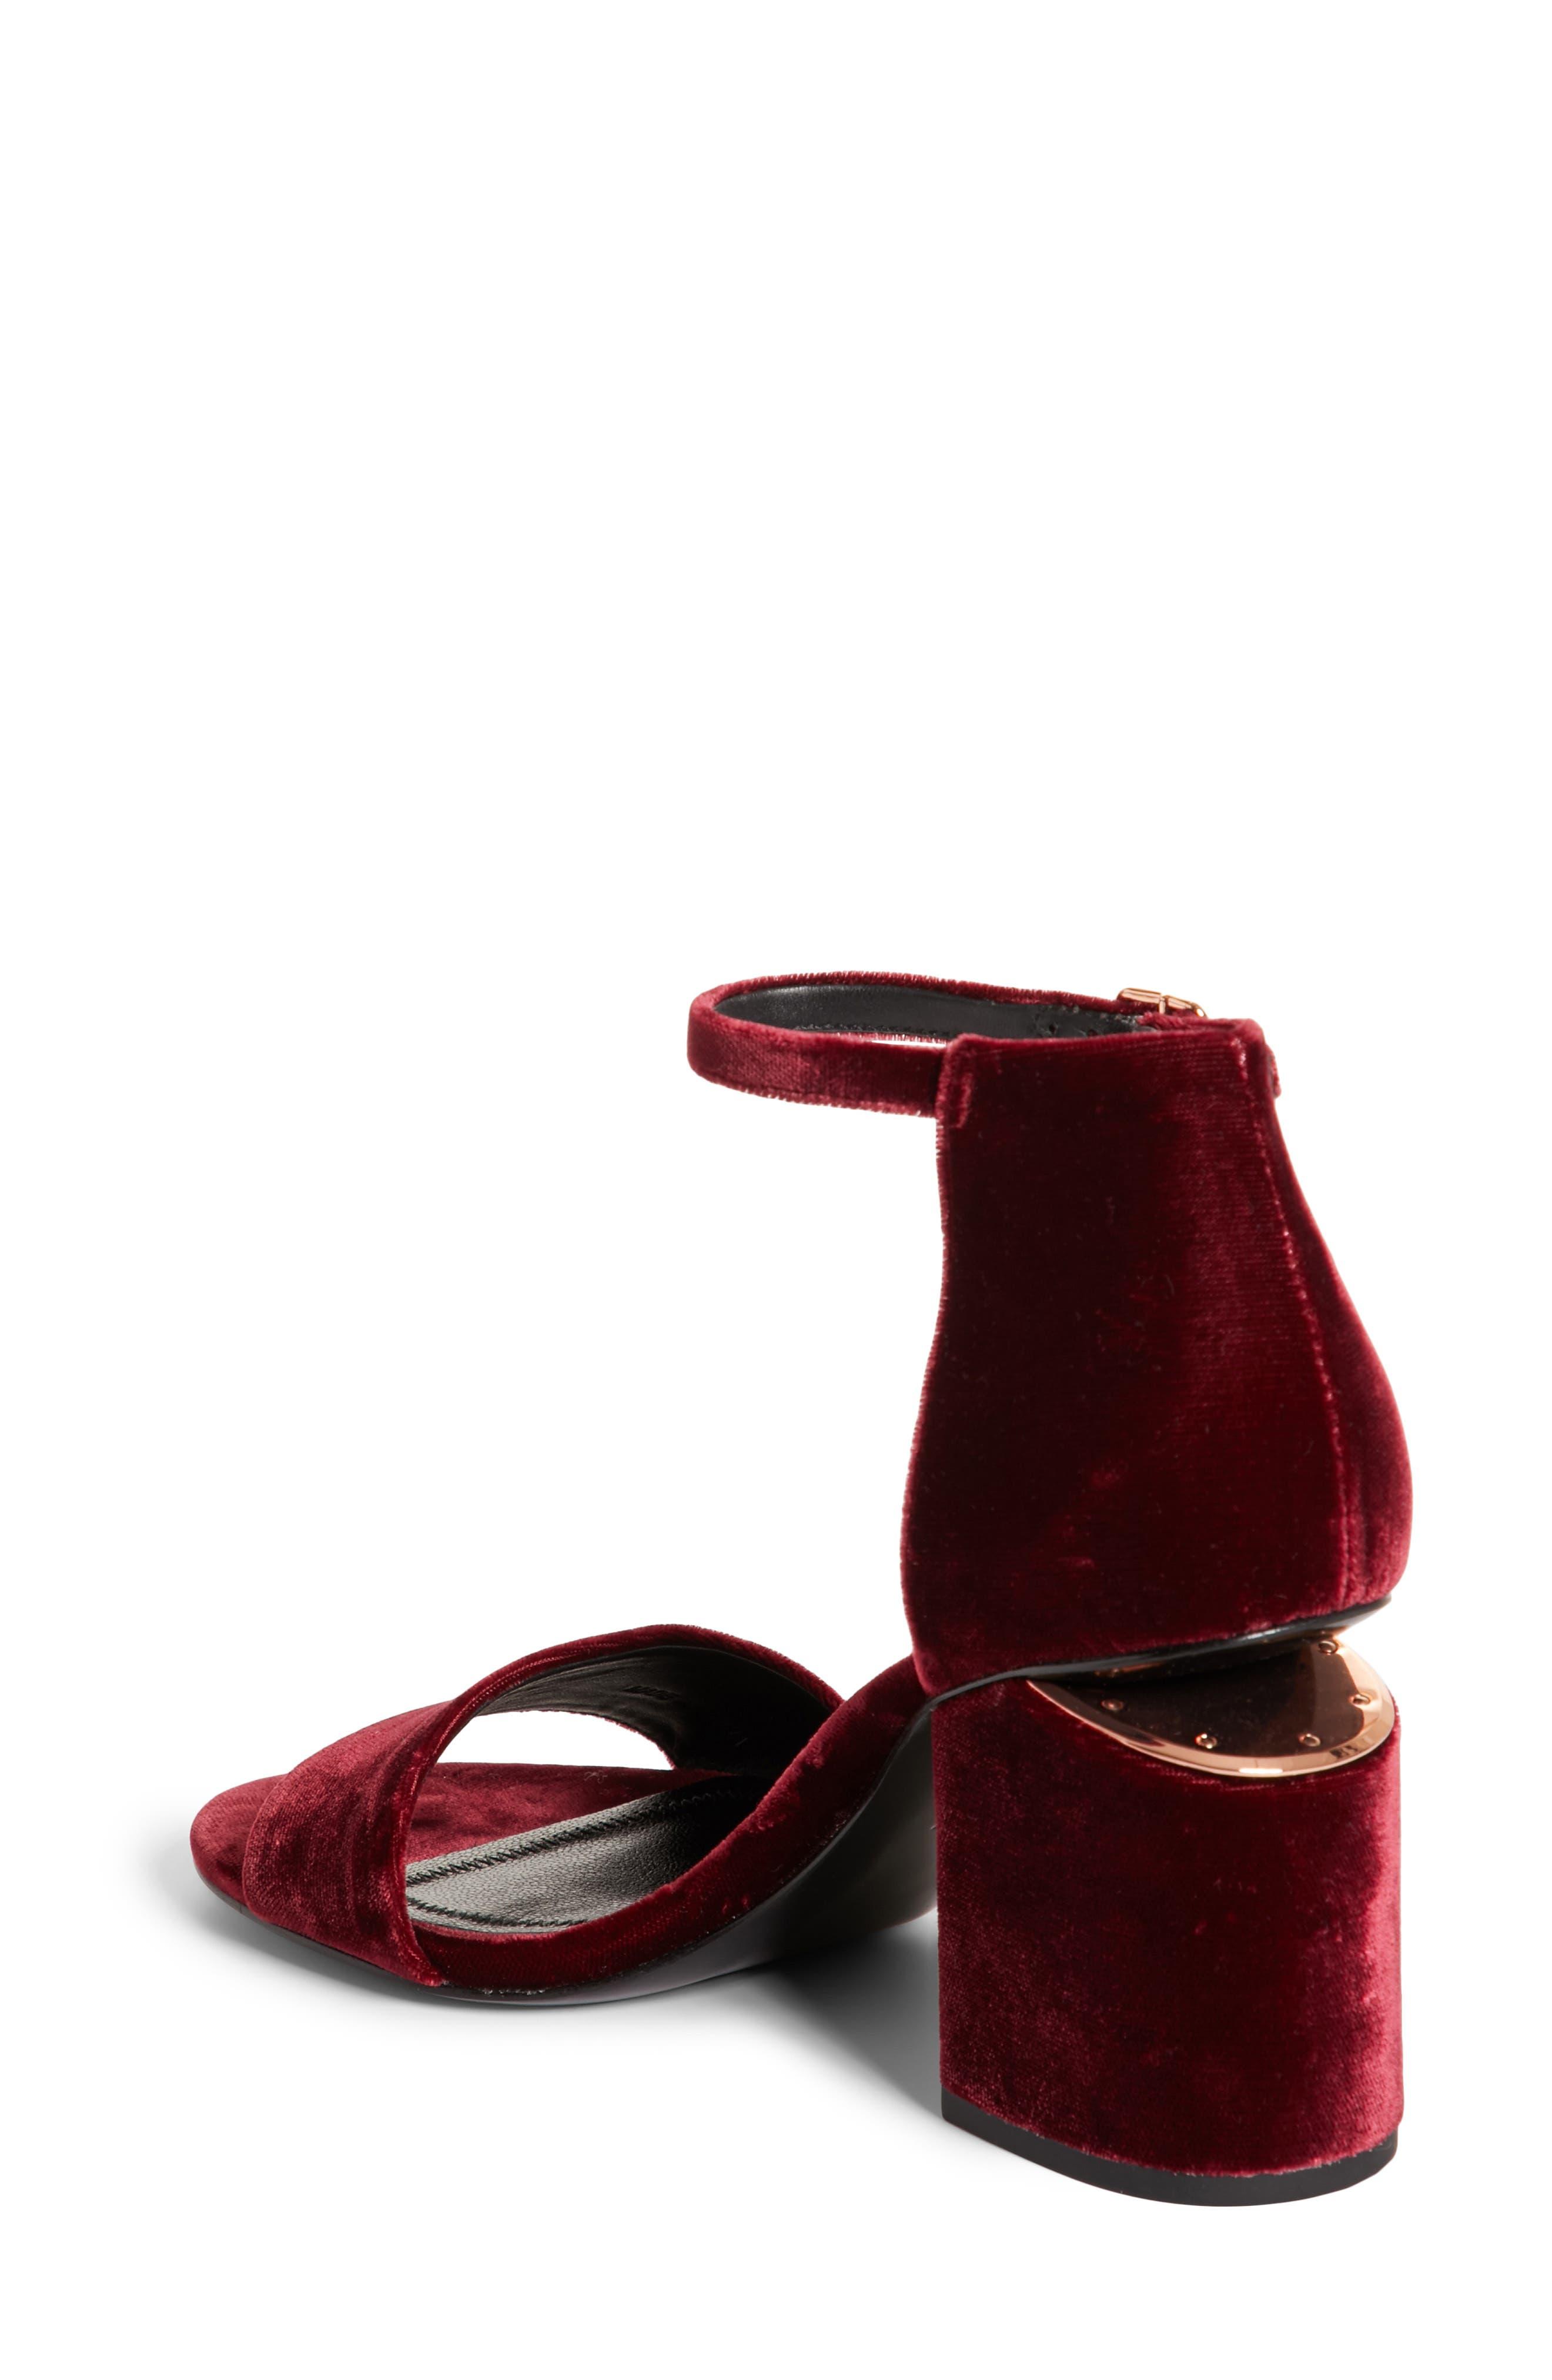 Abby Notch Heel Sandal,                             Alternate thumbnail 2, color,                             930